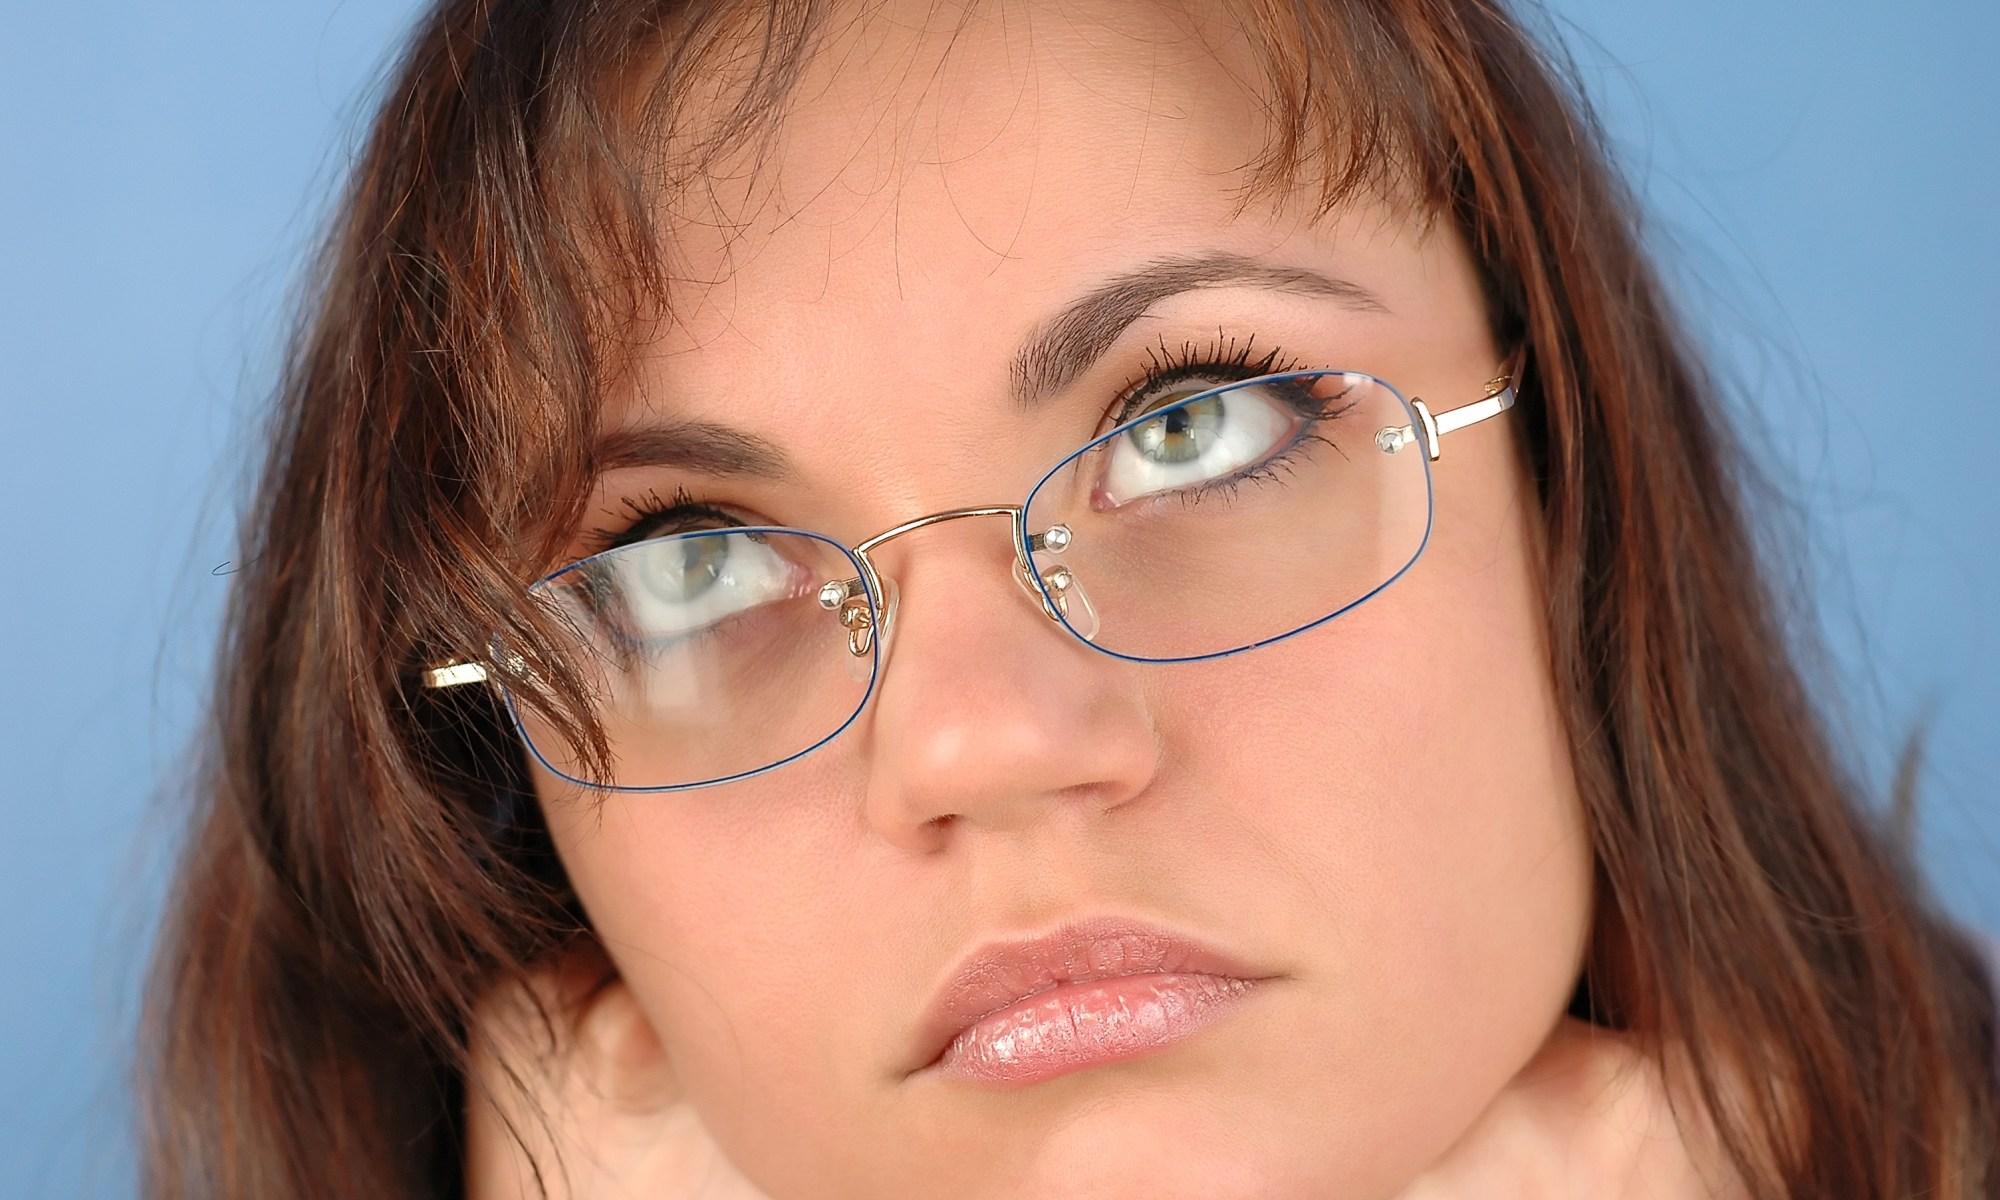 Woman with glasses | © Pensando | Dreamstime Stock Photos